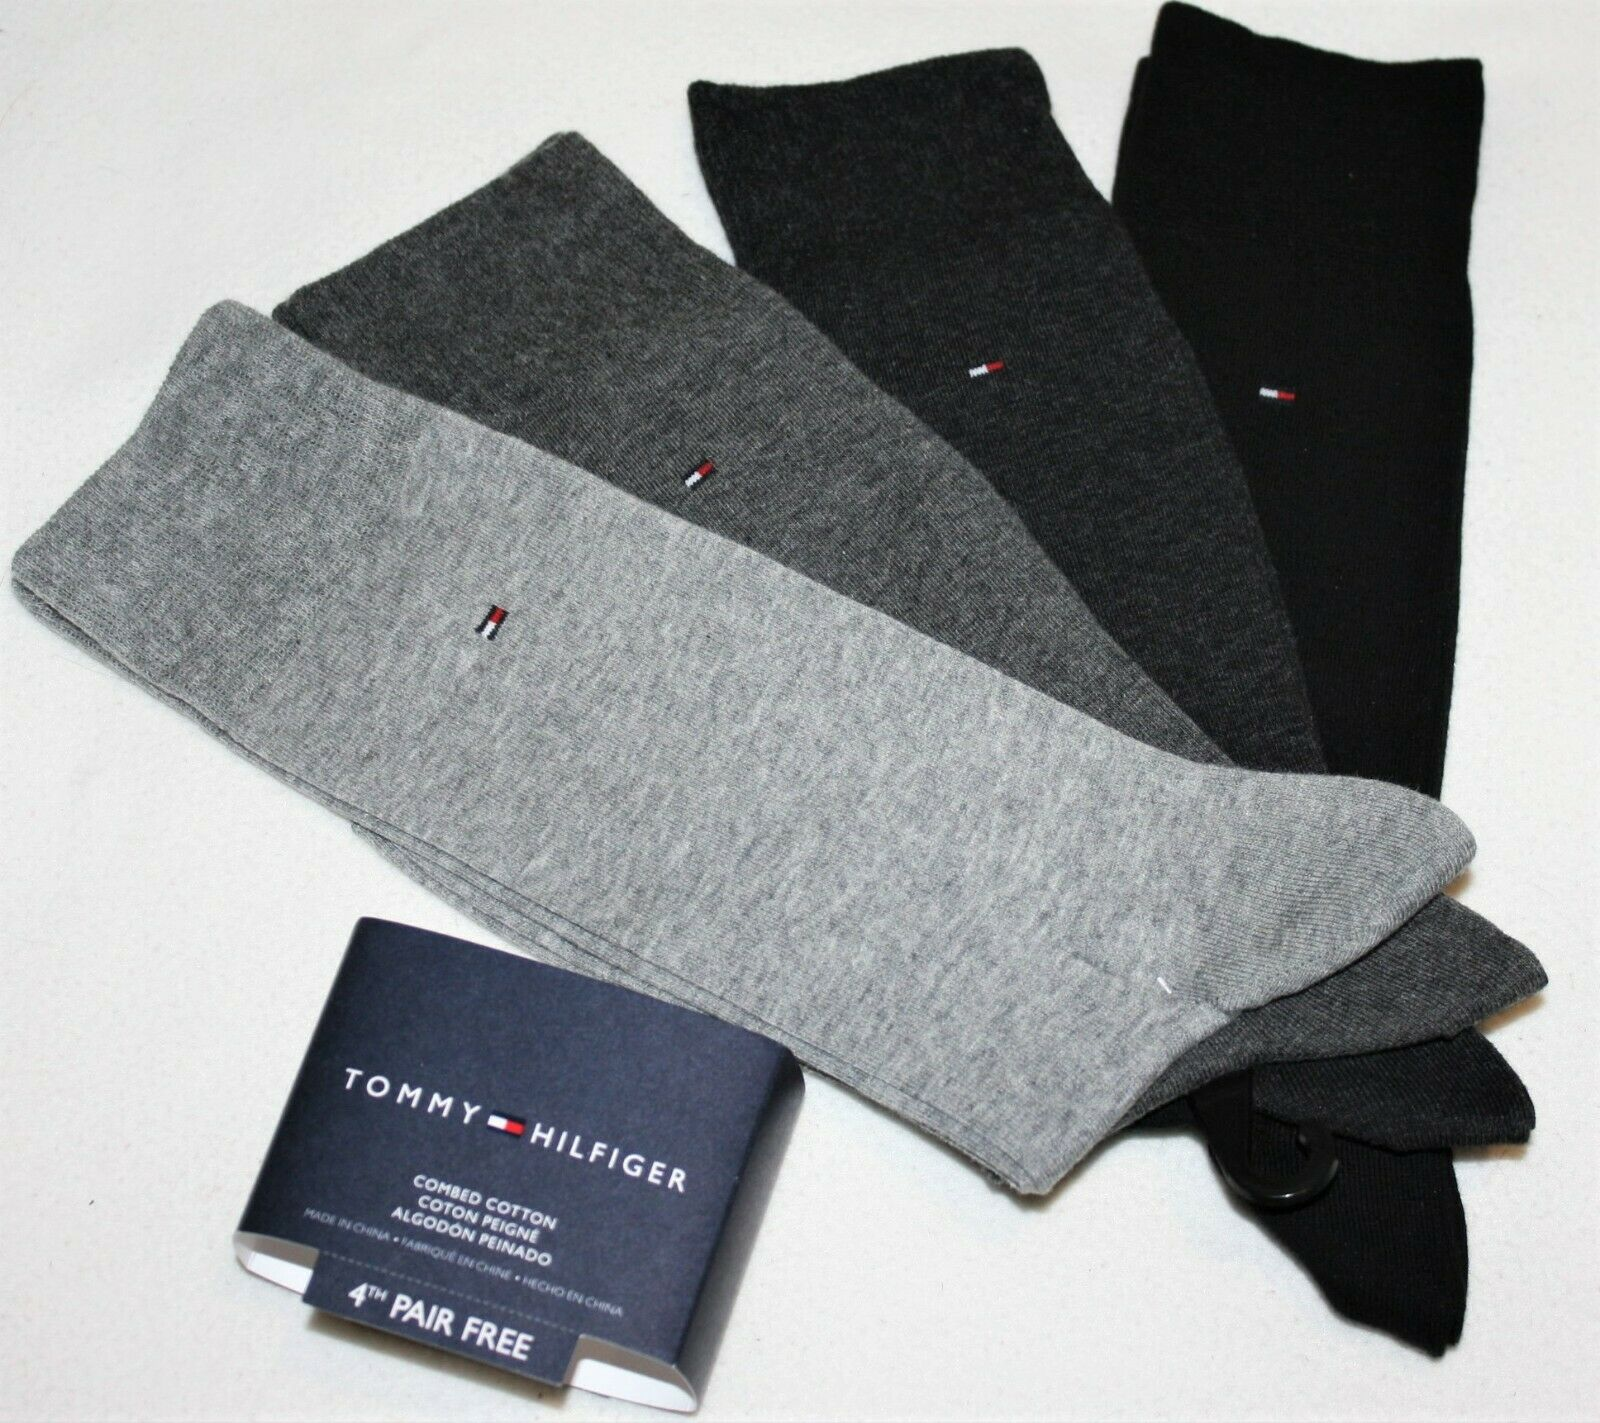 Socken Tommy Hilfiger Mixed Dots Giftbox 4P dark navy 492001001-322